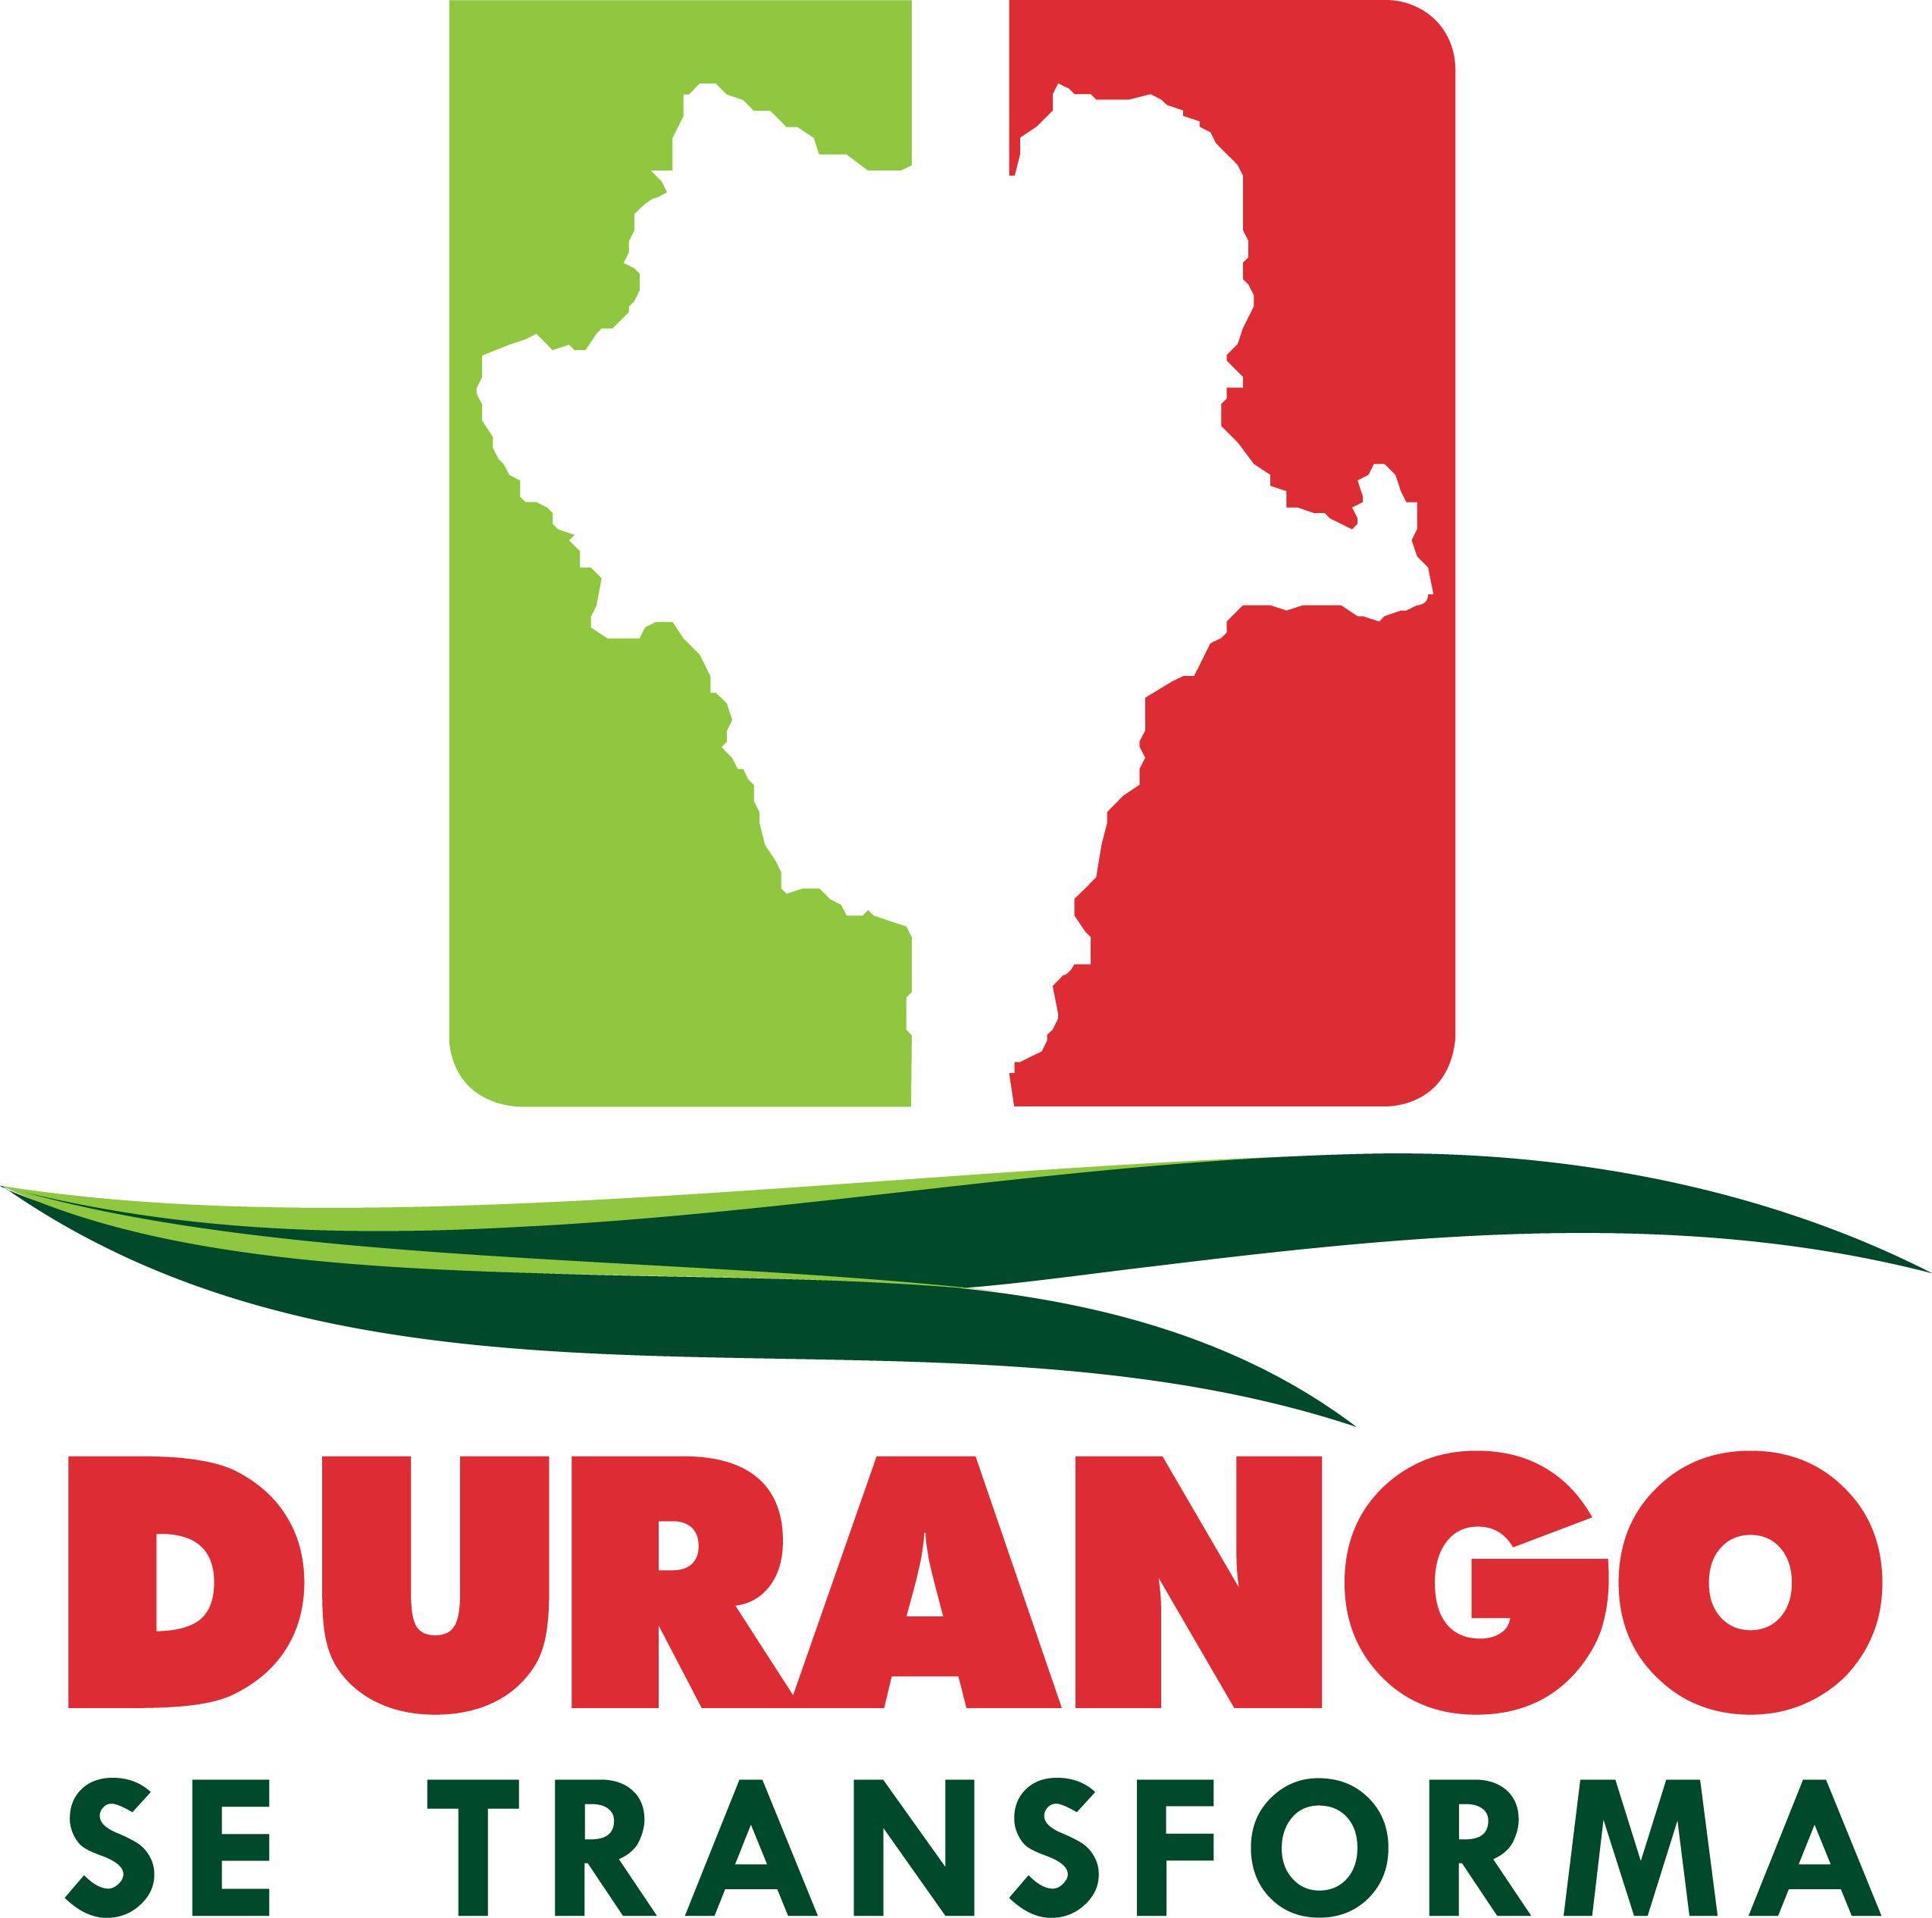 Durango (Government)